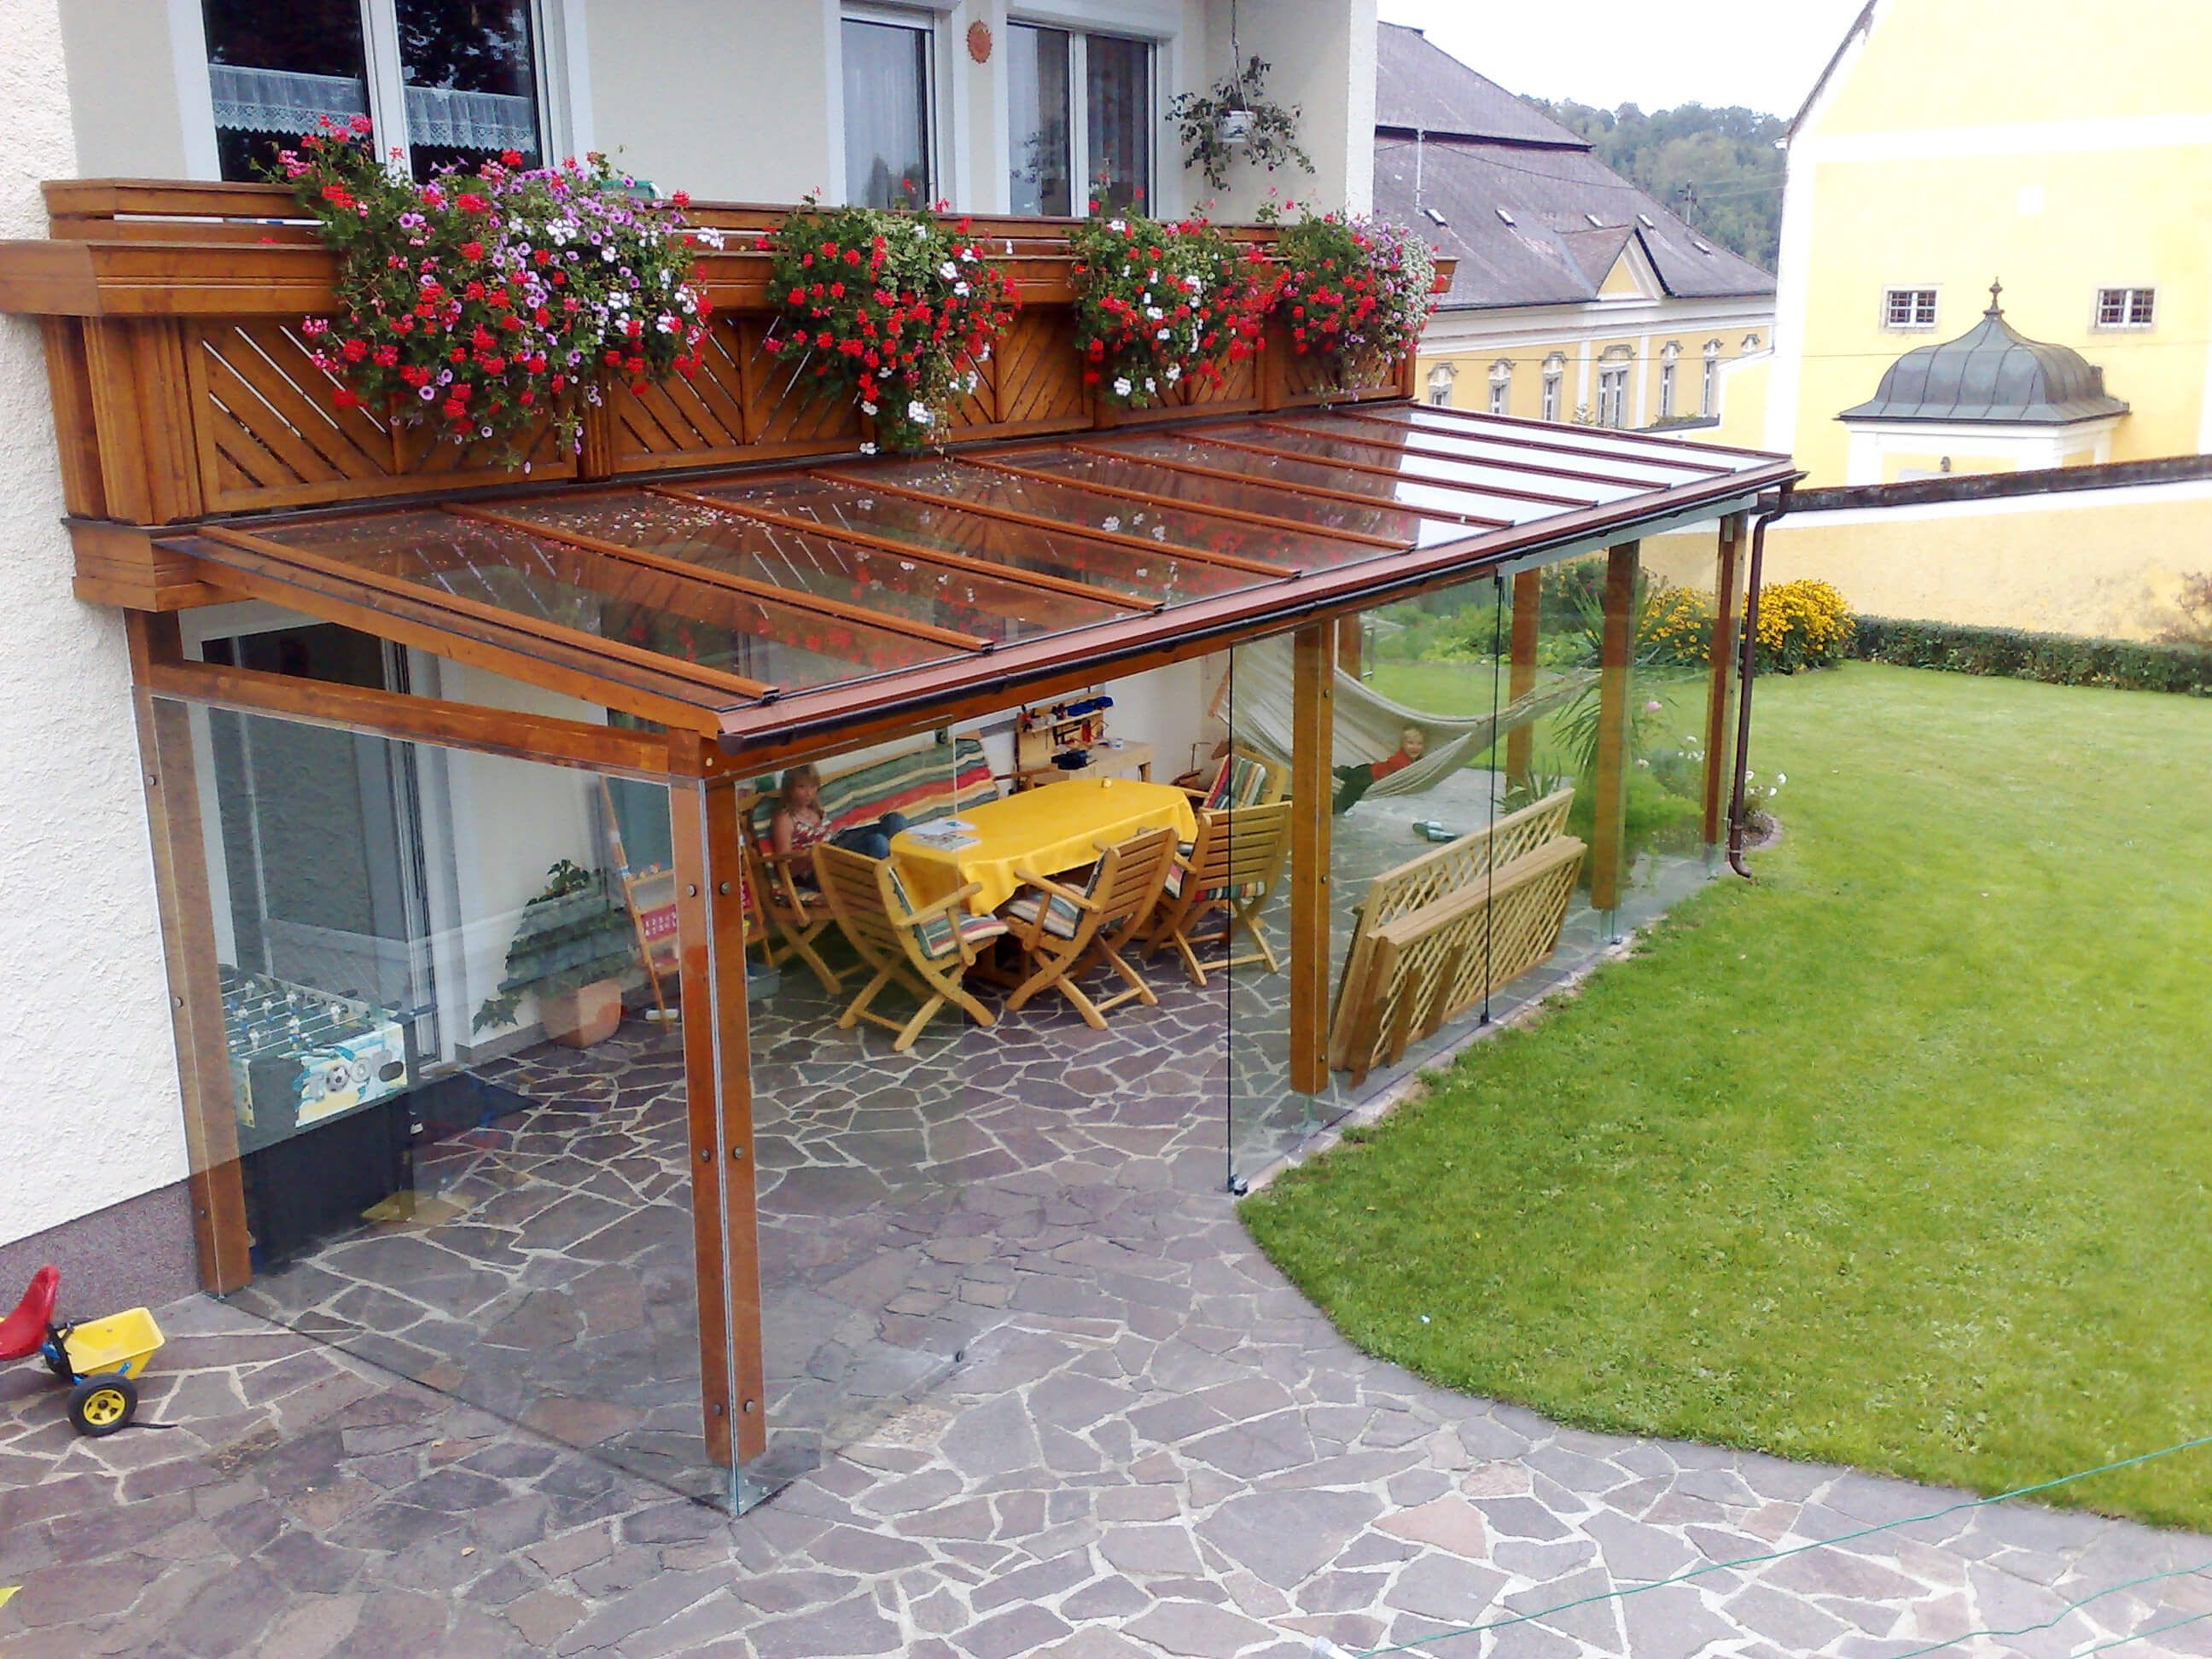 Terrassenuberdachung Pergola Aluminium Holz Mit Bildern Terrassenuberdachung Uberdachung Terrasse Terrassendach